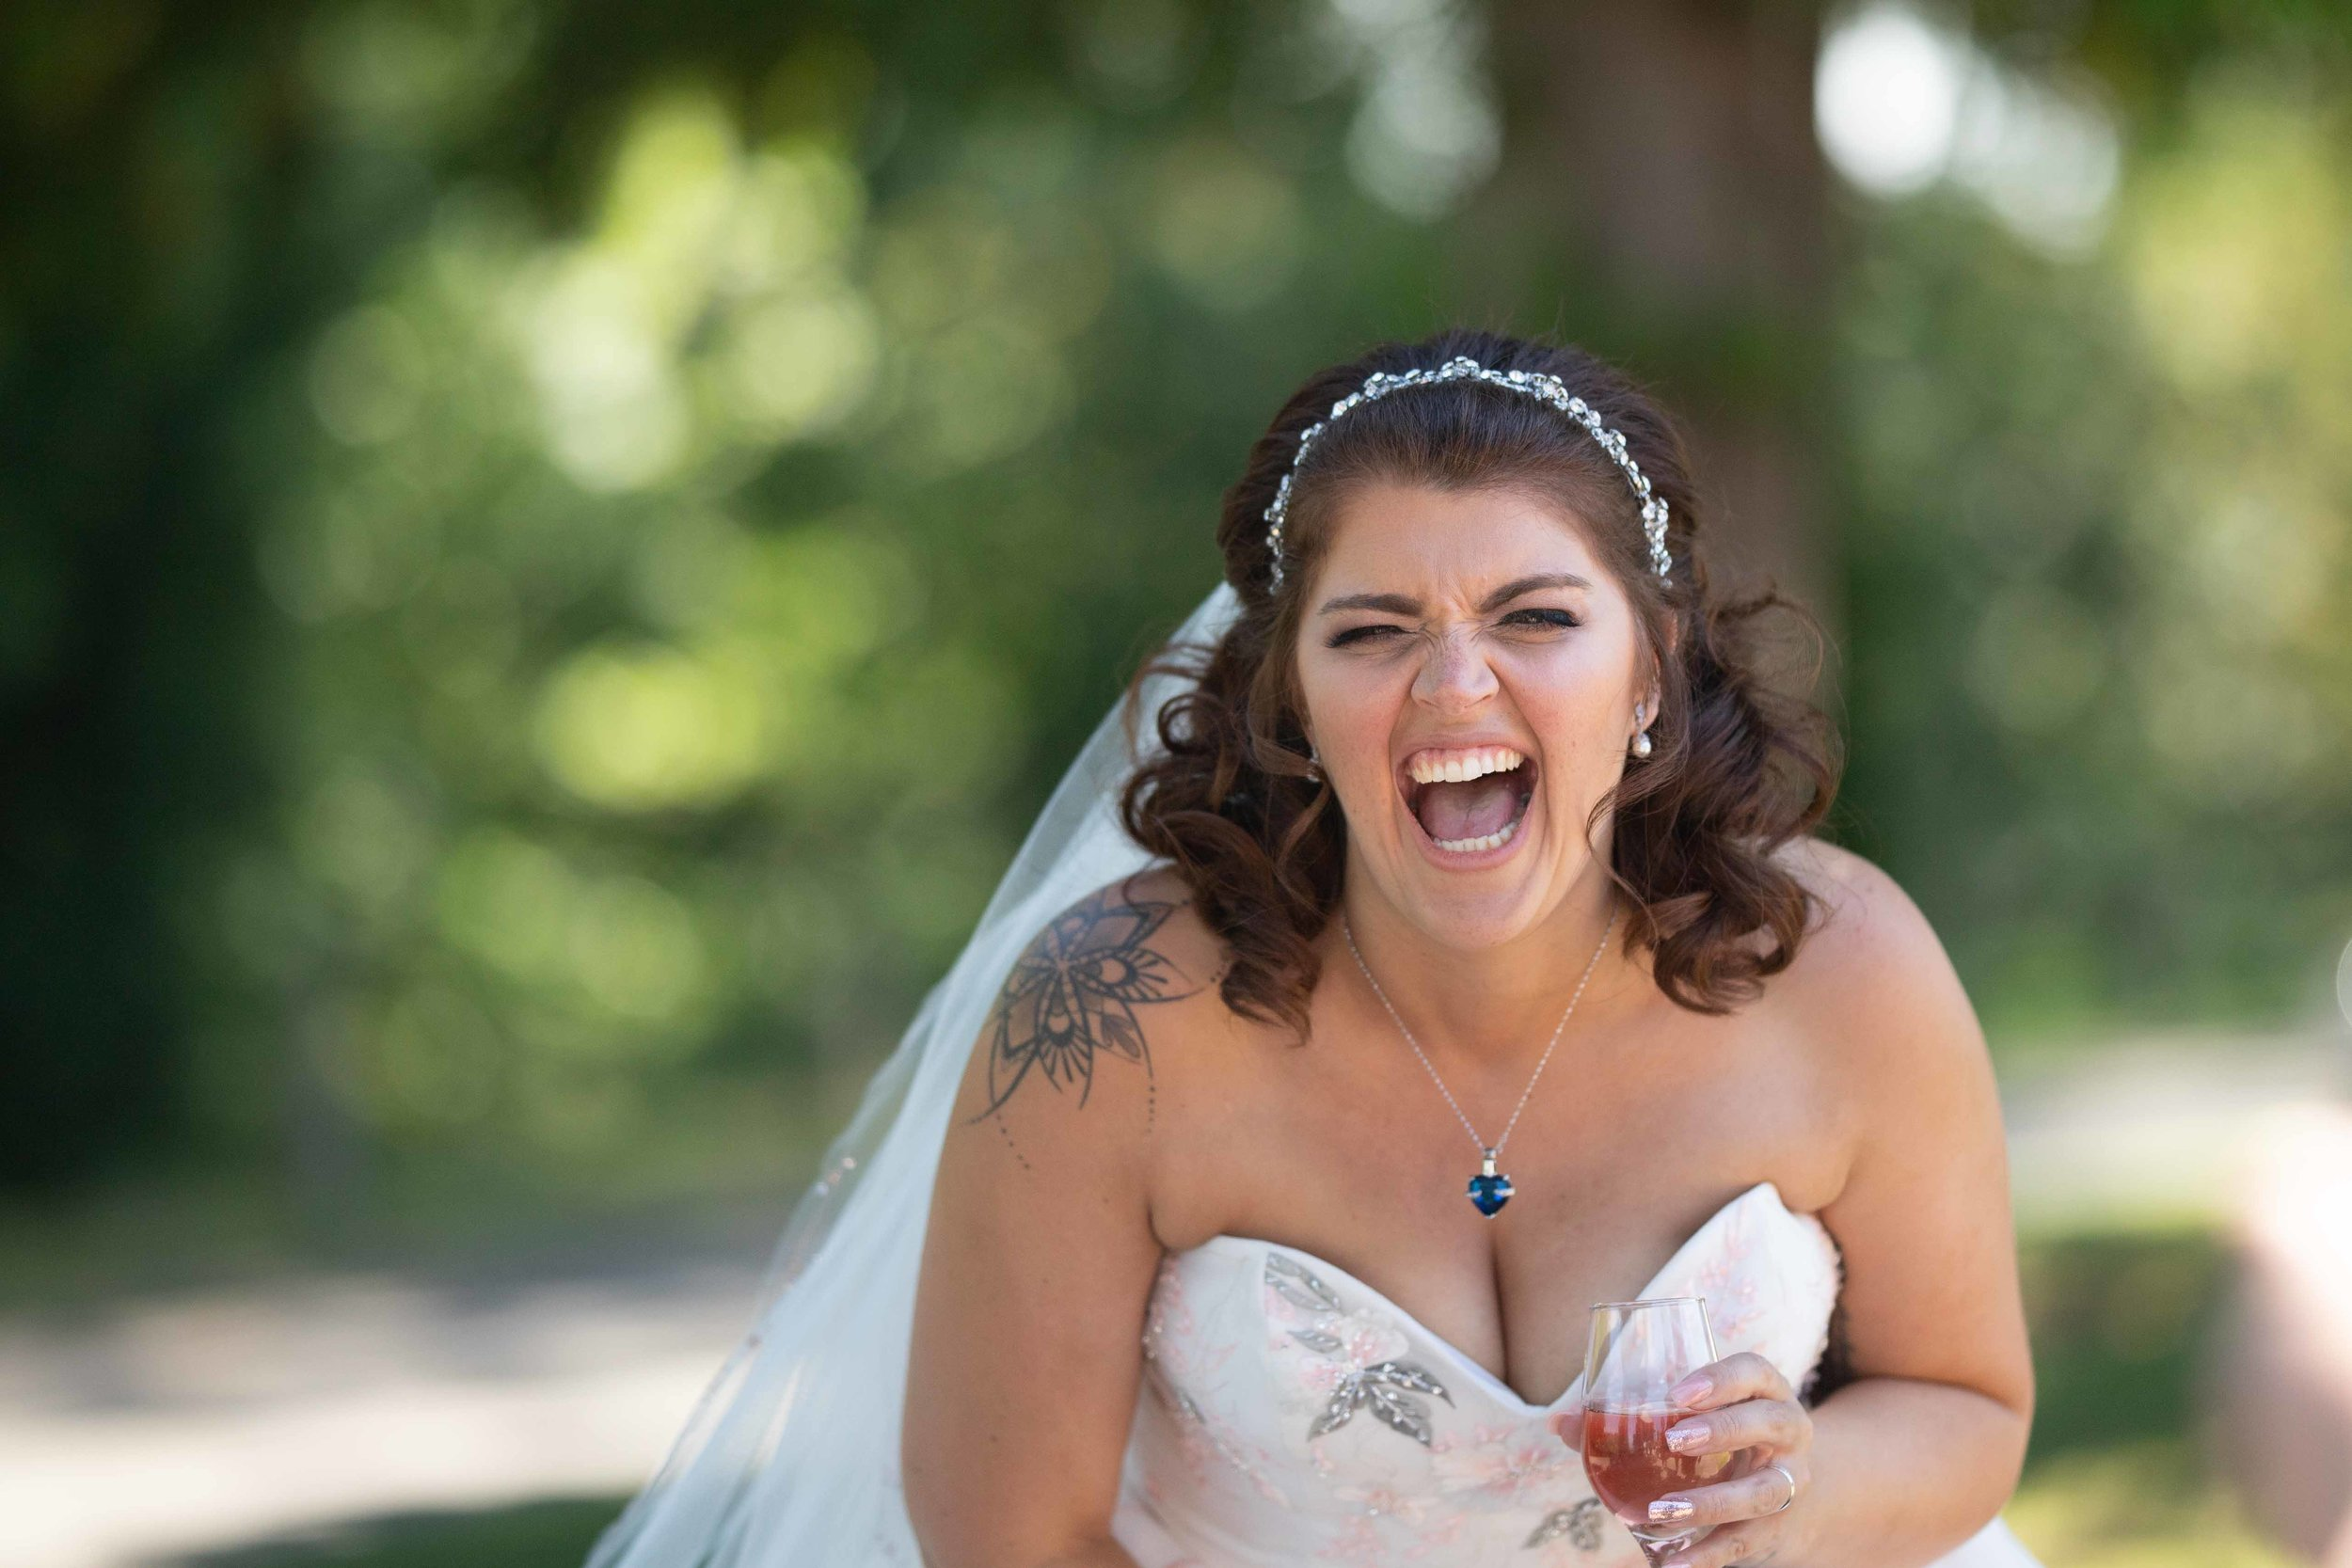 Lea-cooper-photography-wedding-photography-wolverhampton-patshull-park-hotel-wedding-pattingham-wolverhampton-west-midlands-uk-25.JPG